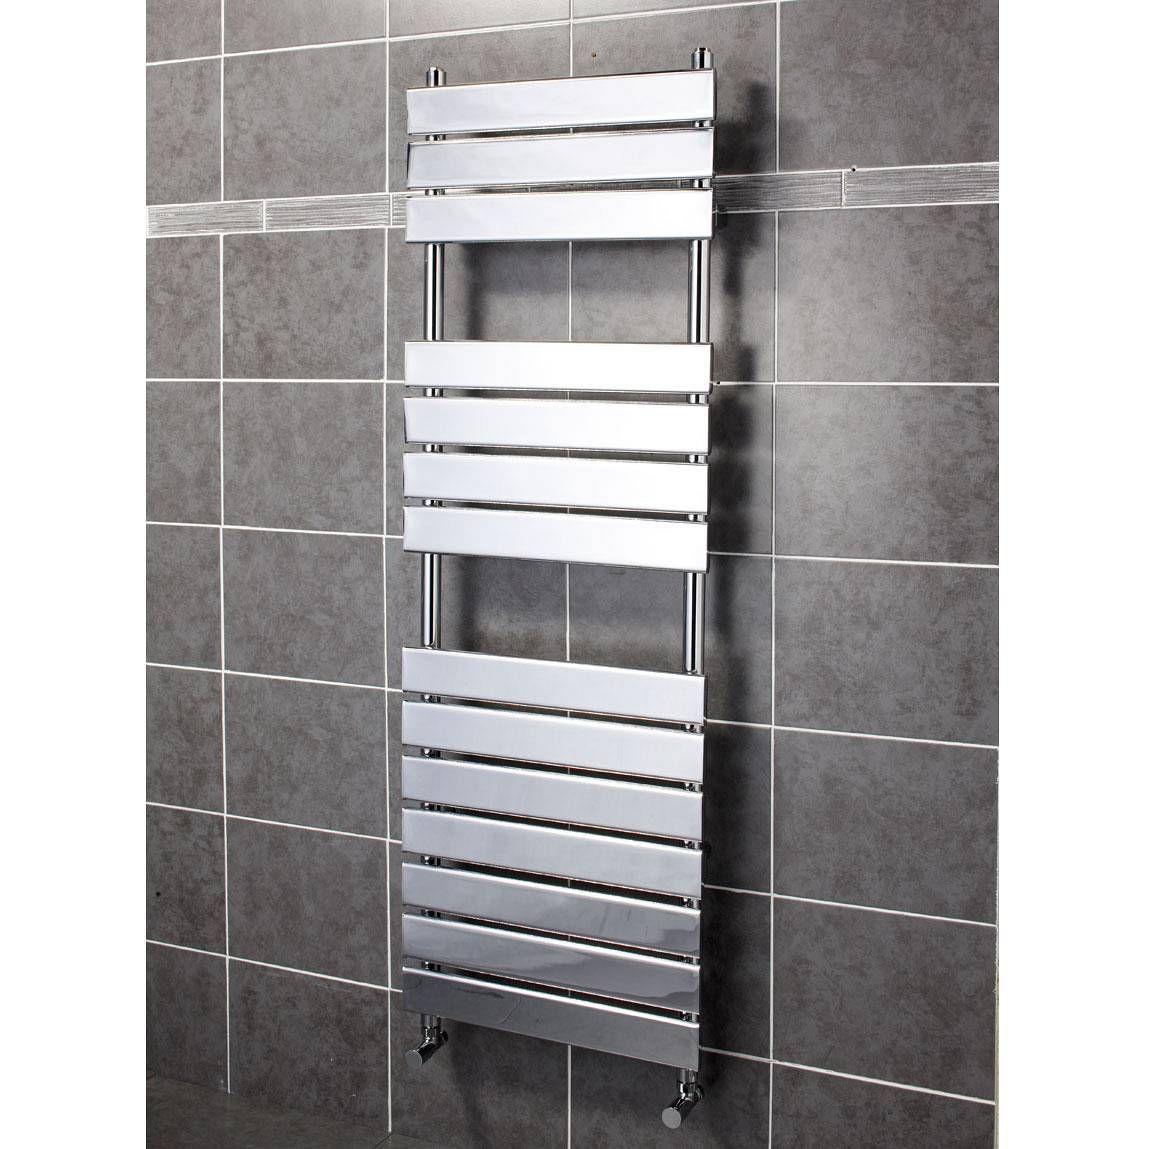 signelle heated towel rail large by victoria plum. Black Bedroom Furniture Sets. Home Design Ideas